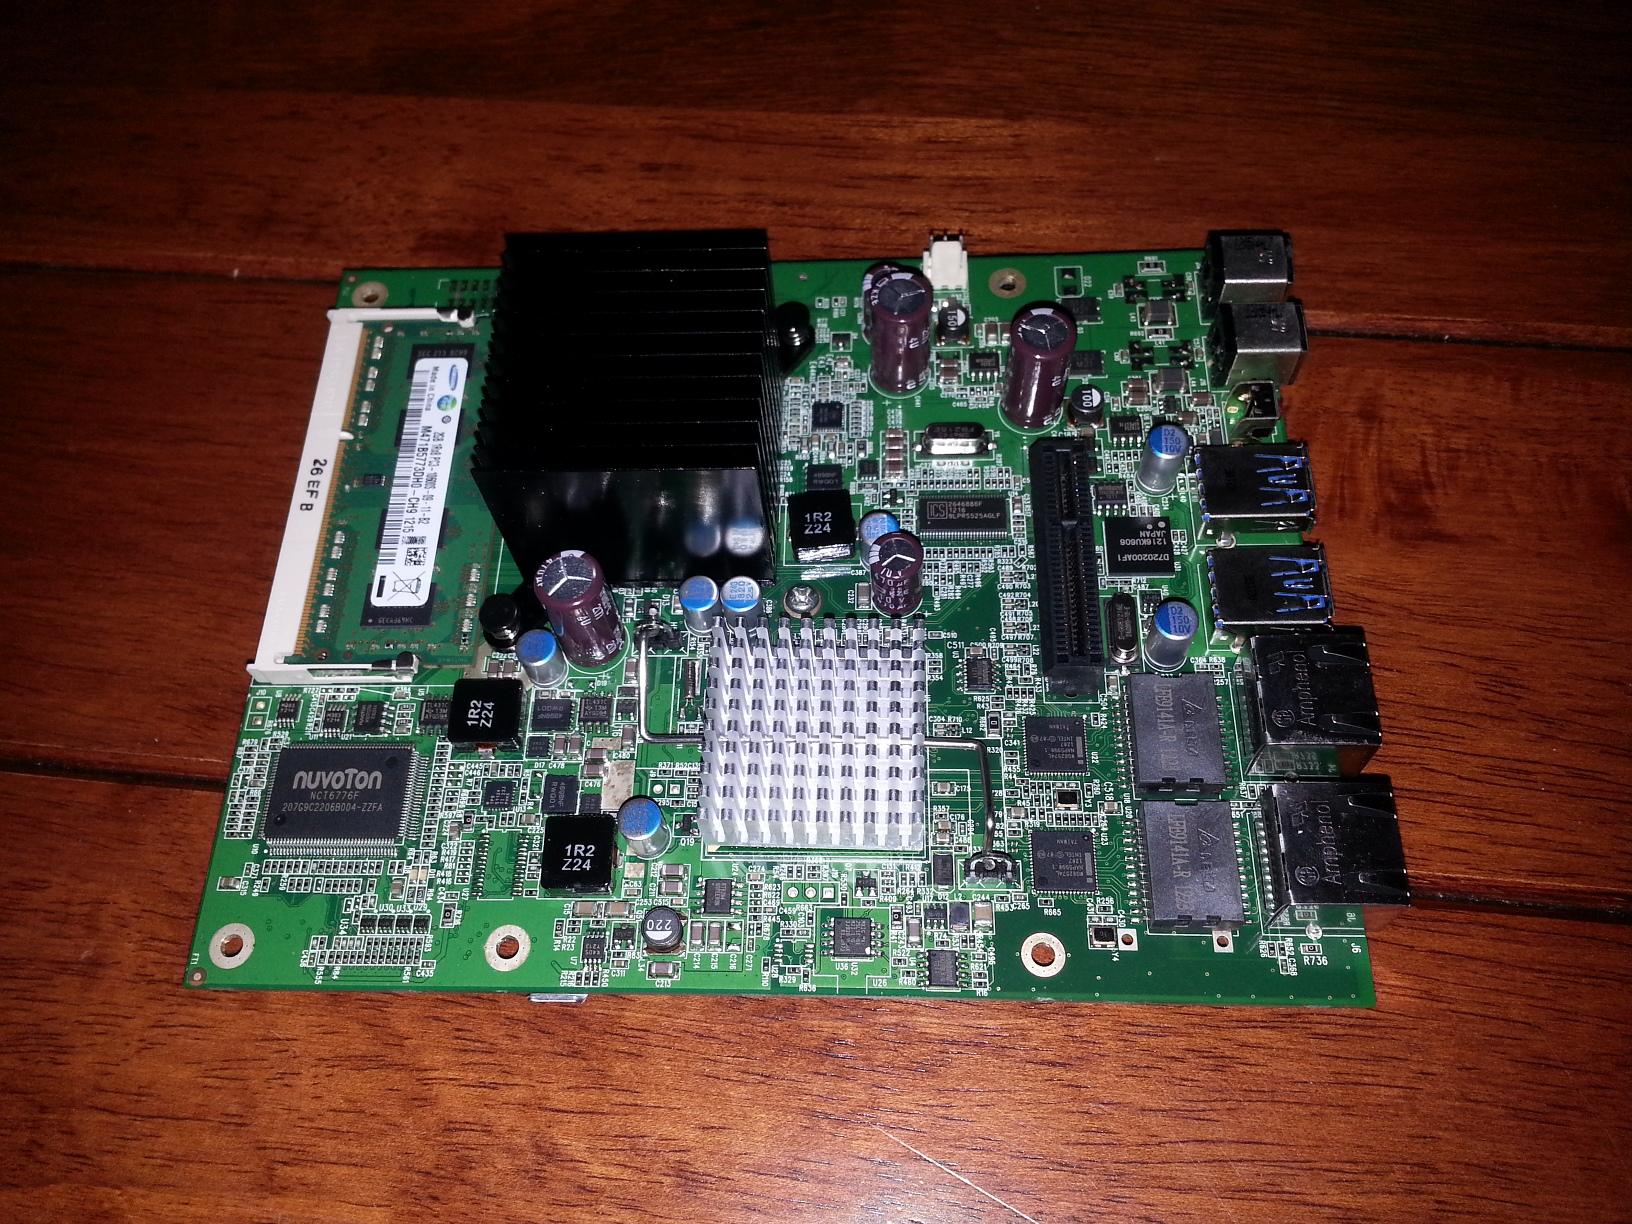 Western Digital DX4000 Motherboard